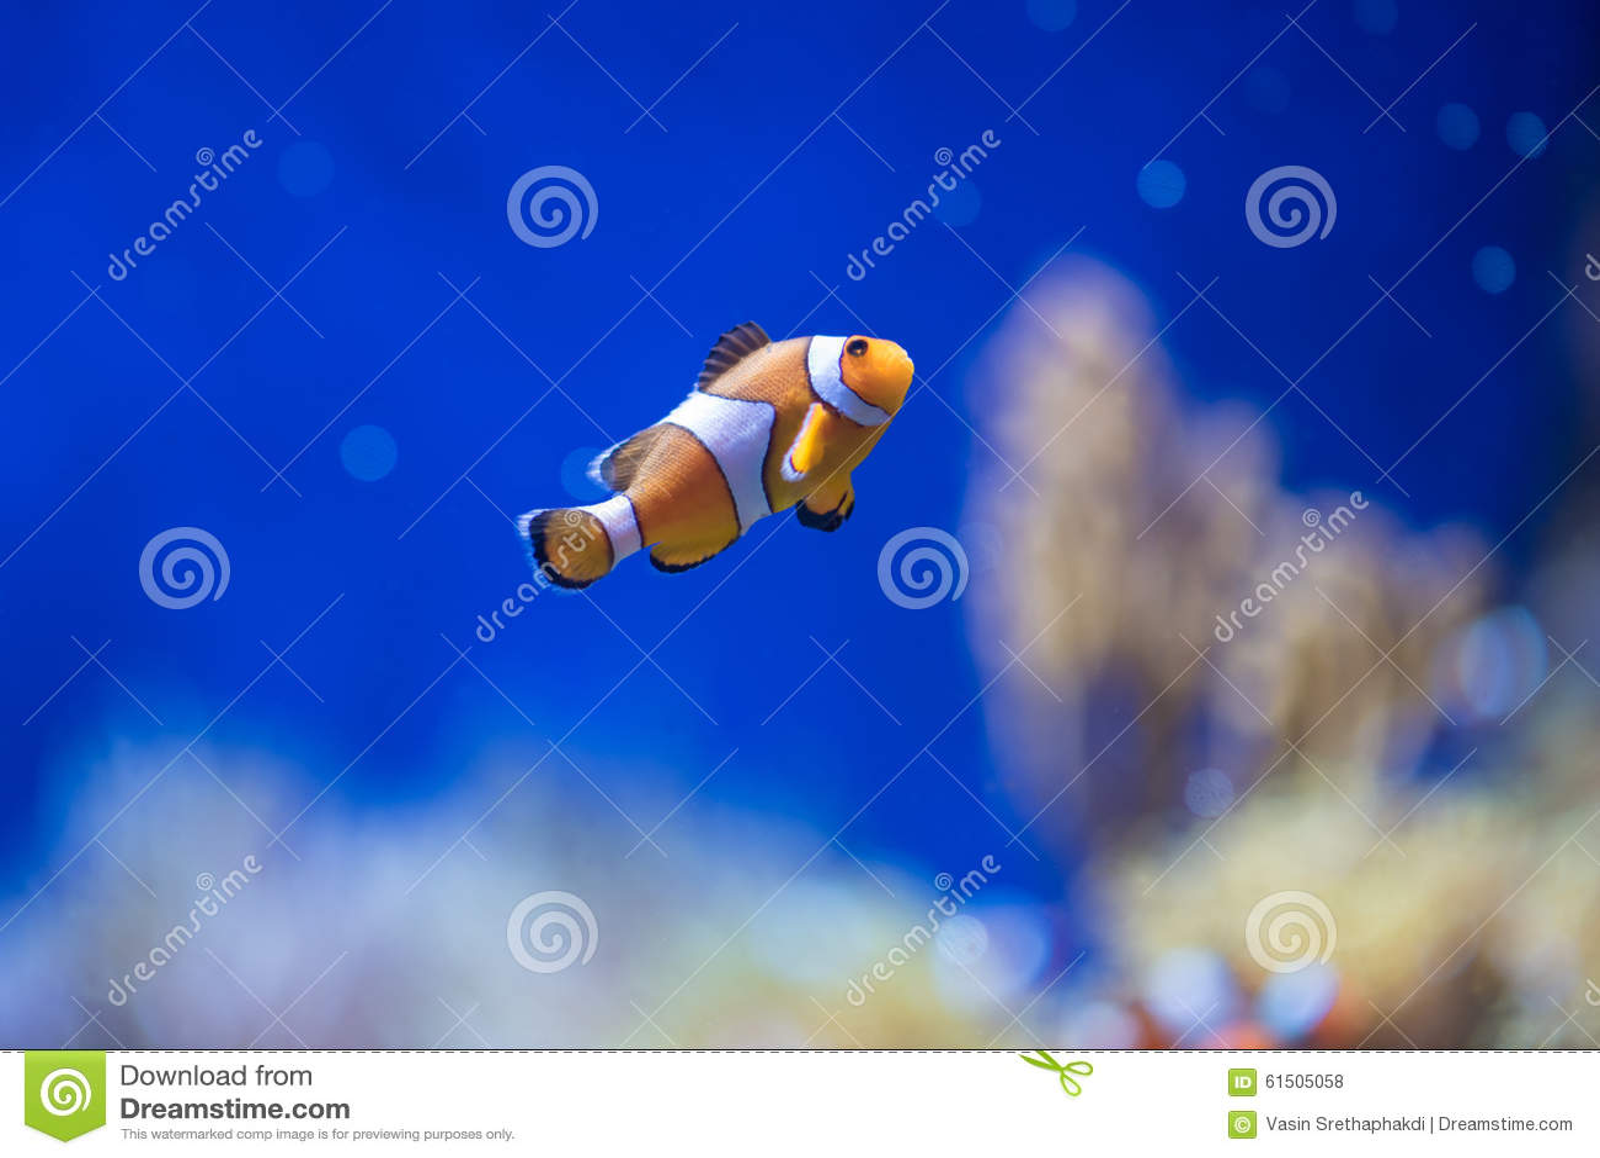 orange jpg deep blue - photo #24